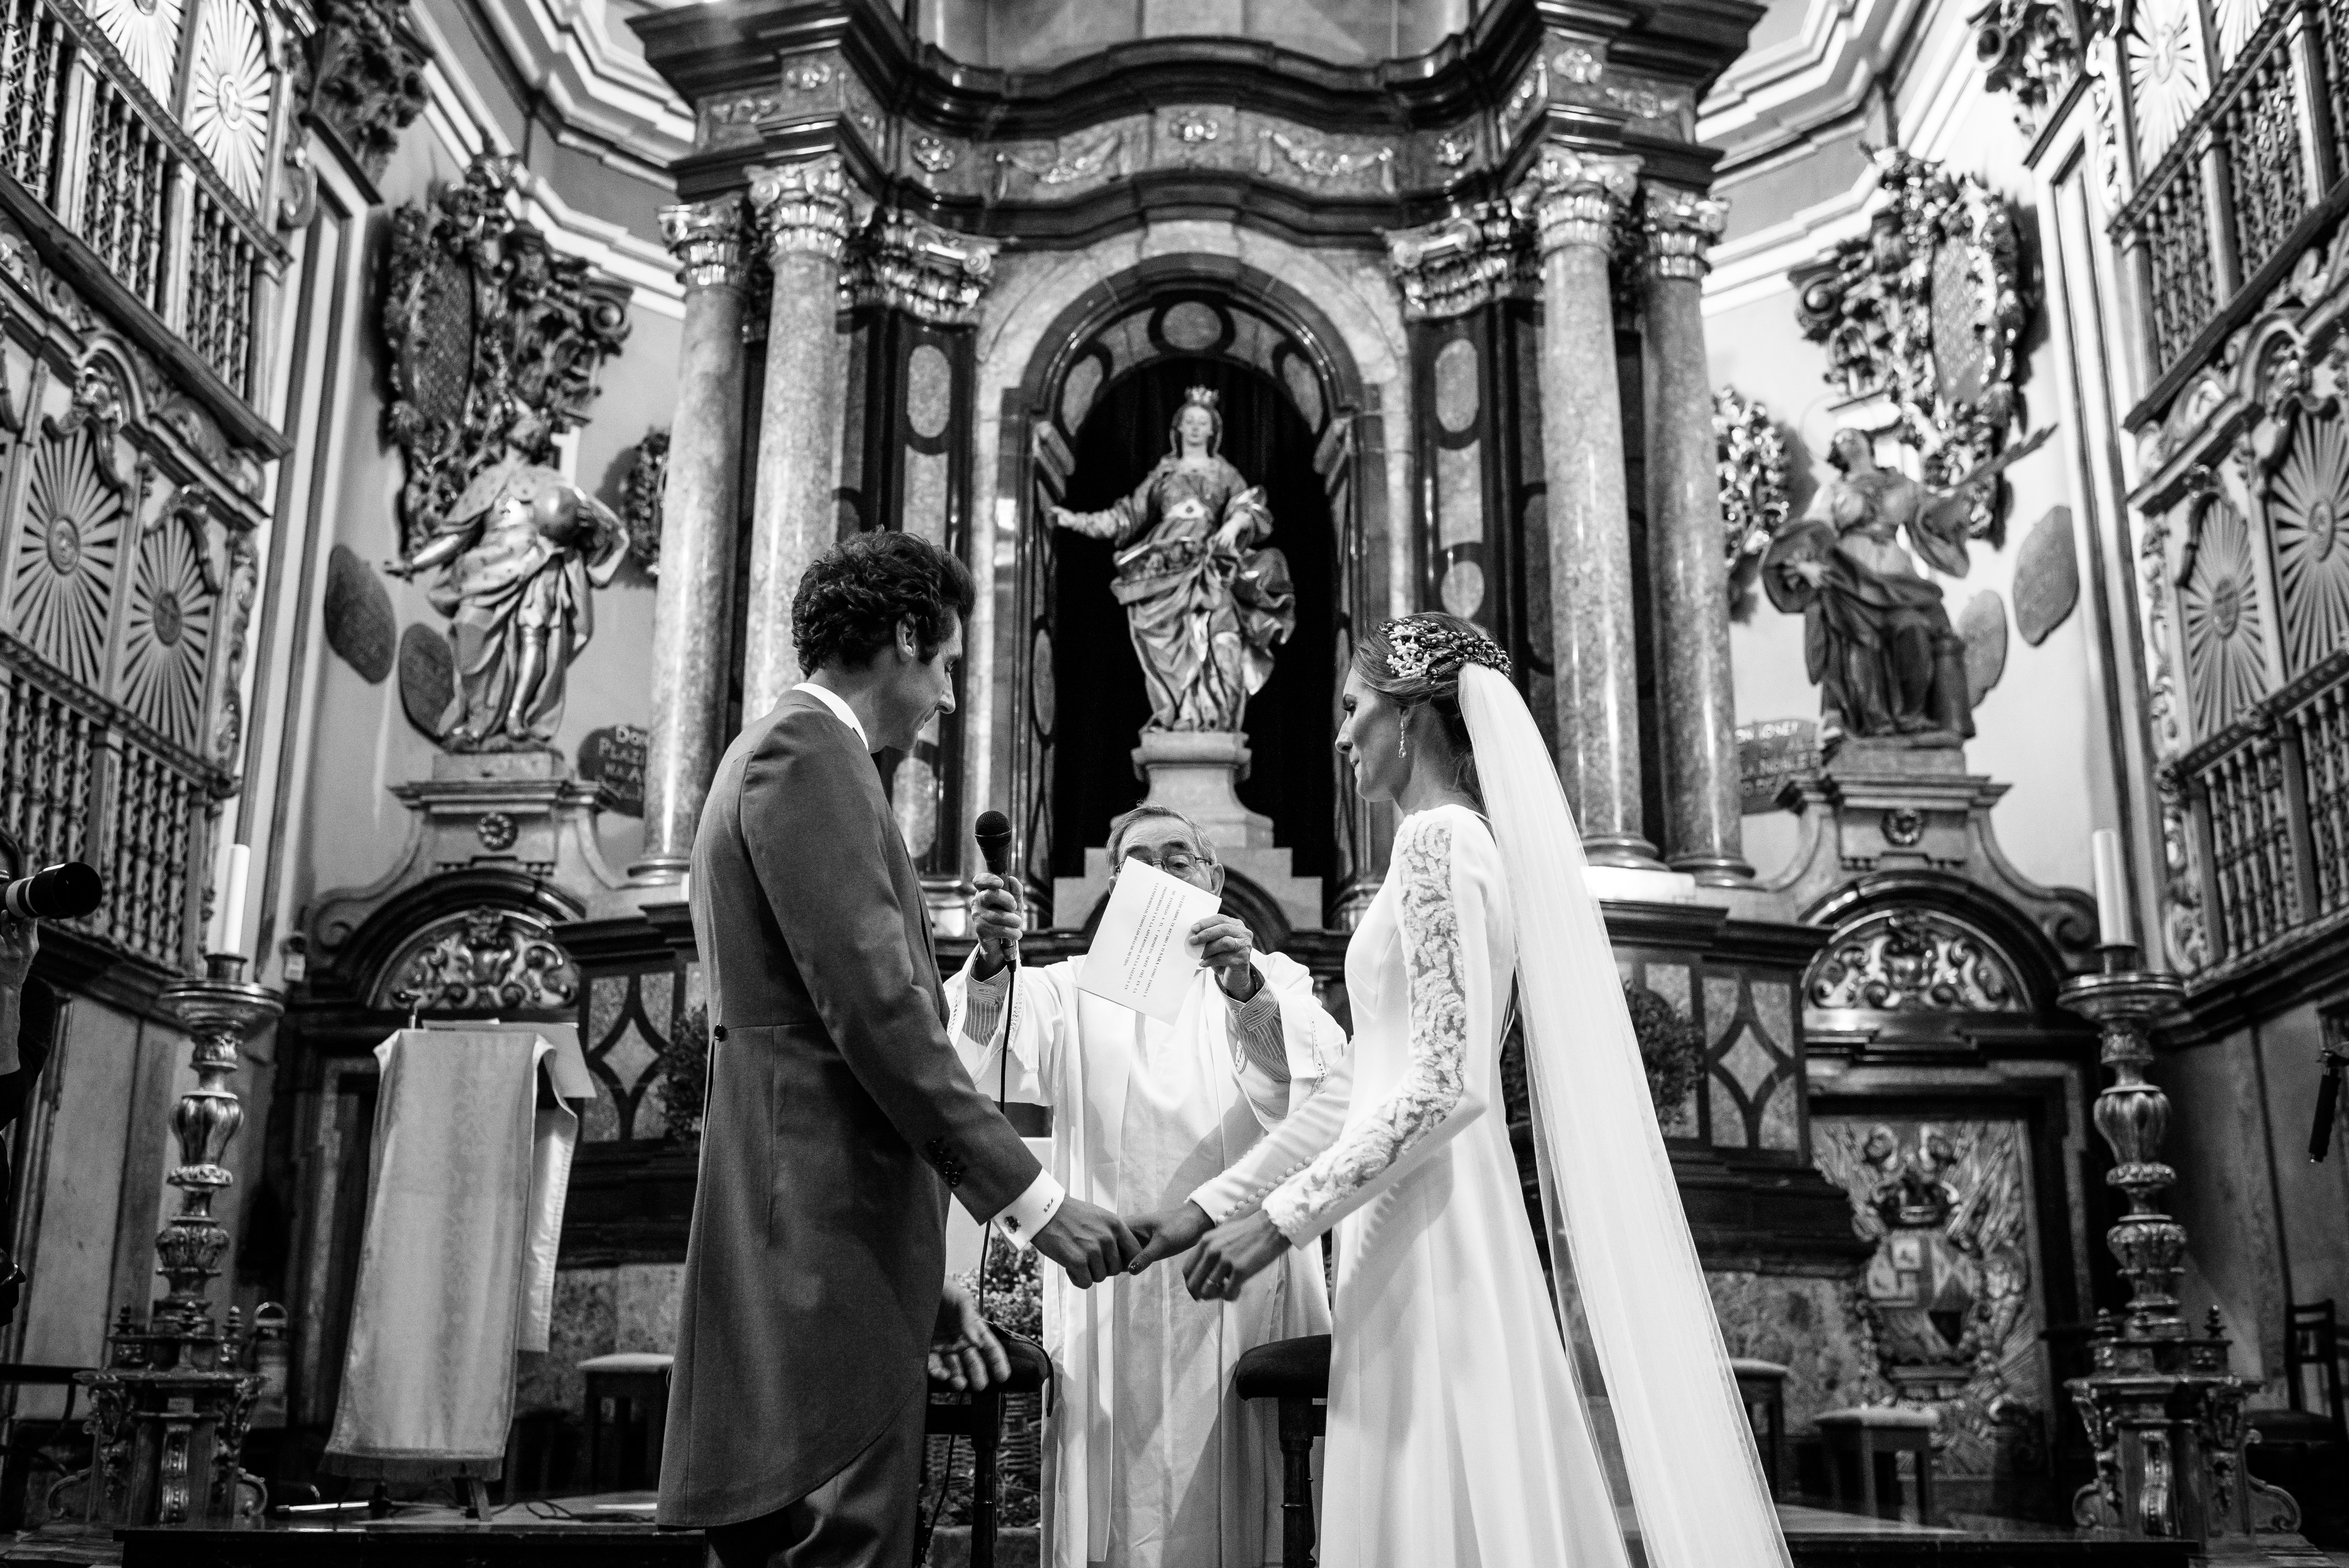 mandarina weddig, fotografos de boda, fotografo boda soria, fotografo boda barcelona, fotografo boda Madrid, fotografo boda lerida, fotografo boda Huesca_28